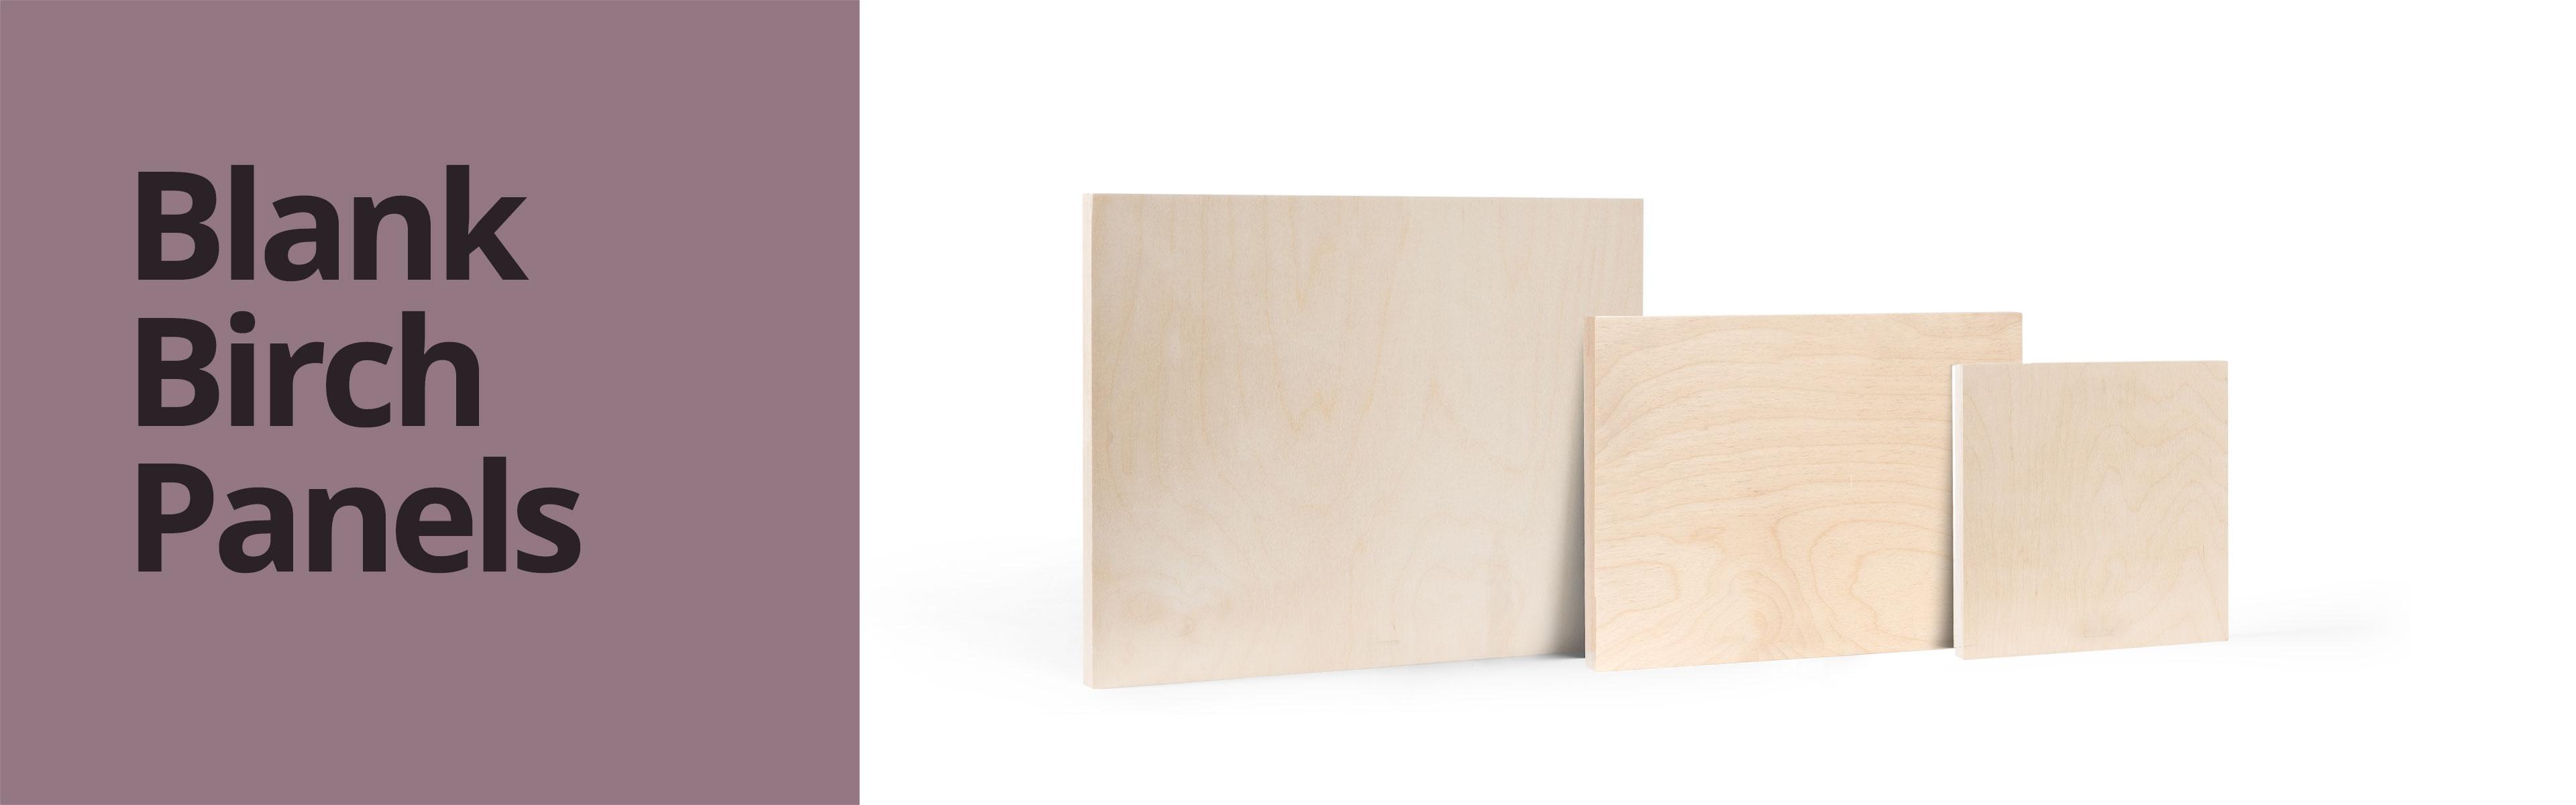 Blank Birch Panels